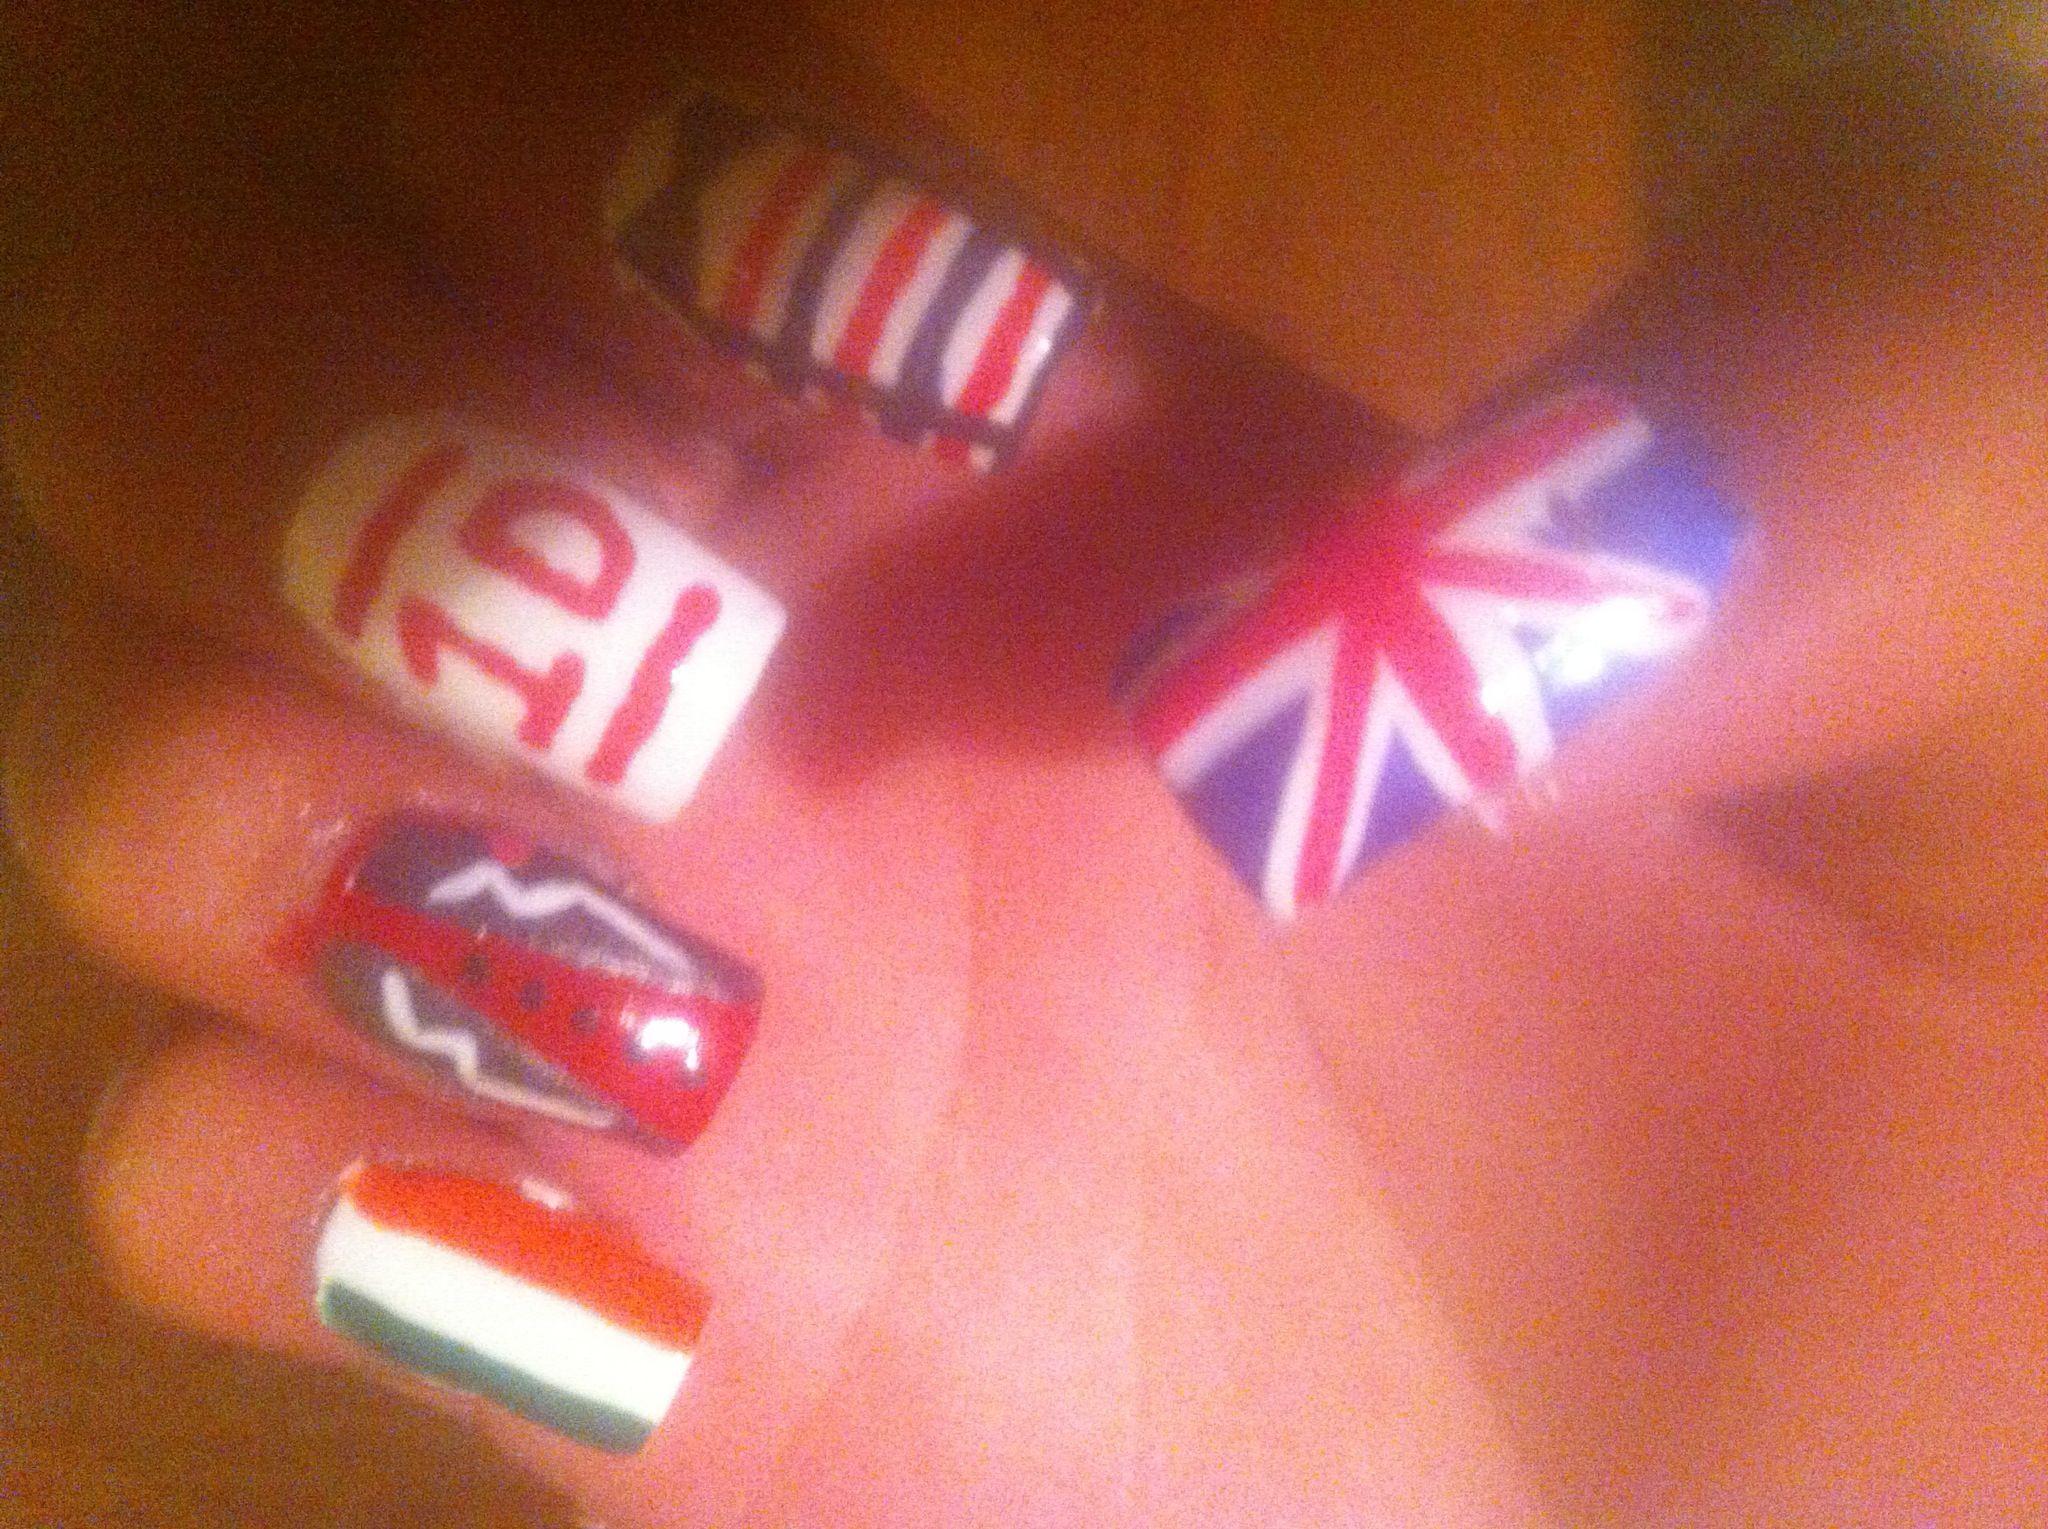 10 best diseños de uñas para niñas images on Pinterest | Nail ...